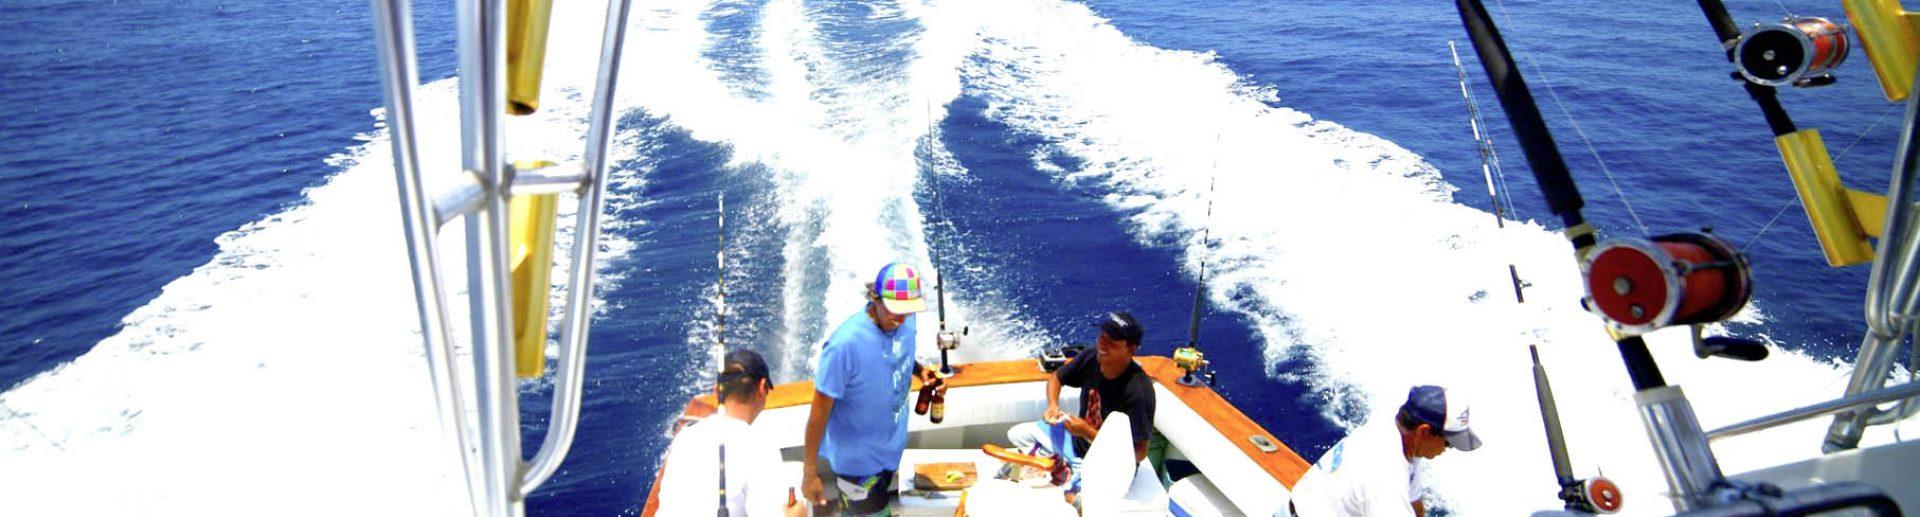 escualo-fishing-on-cruiser